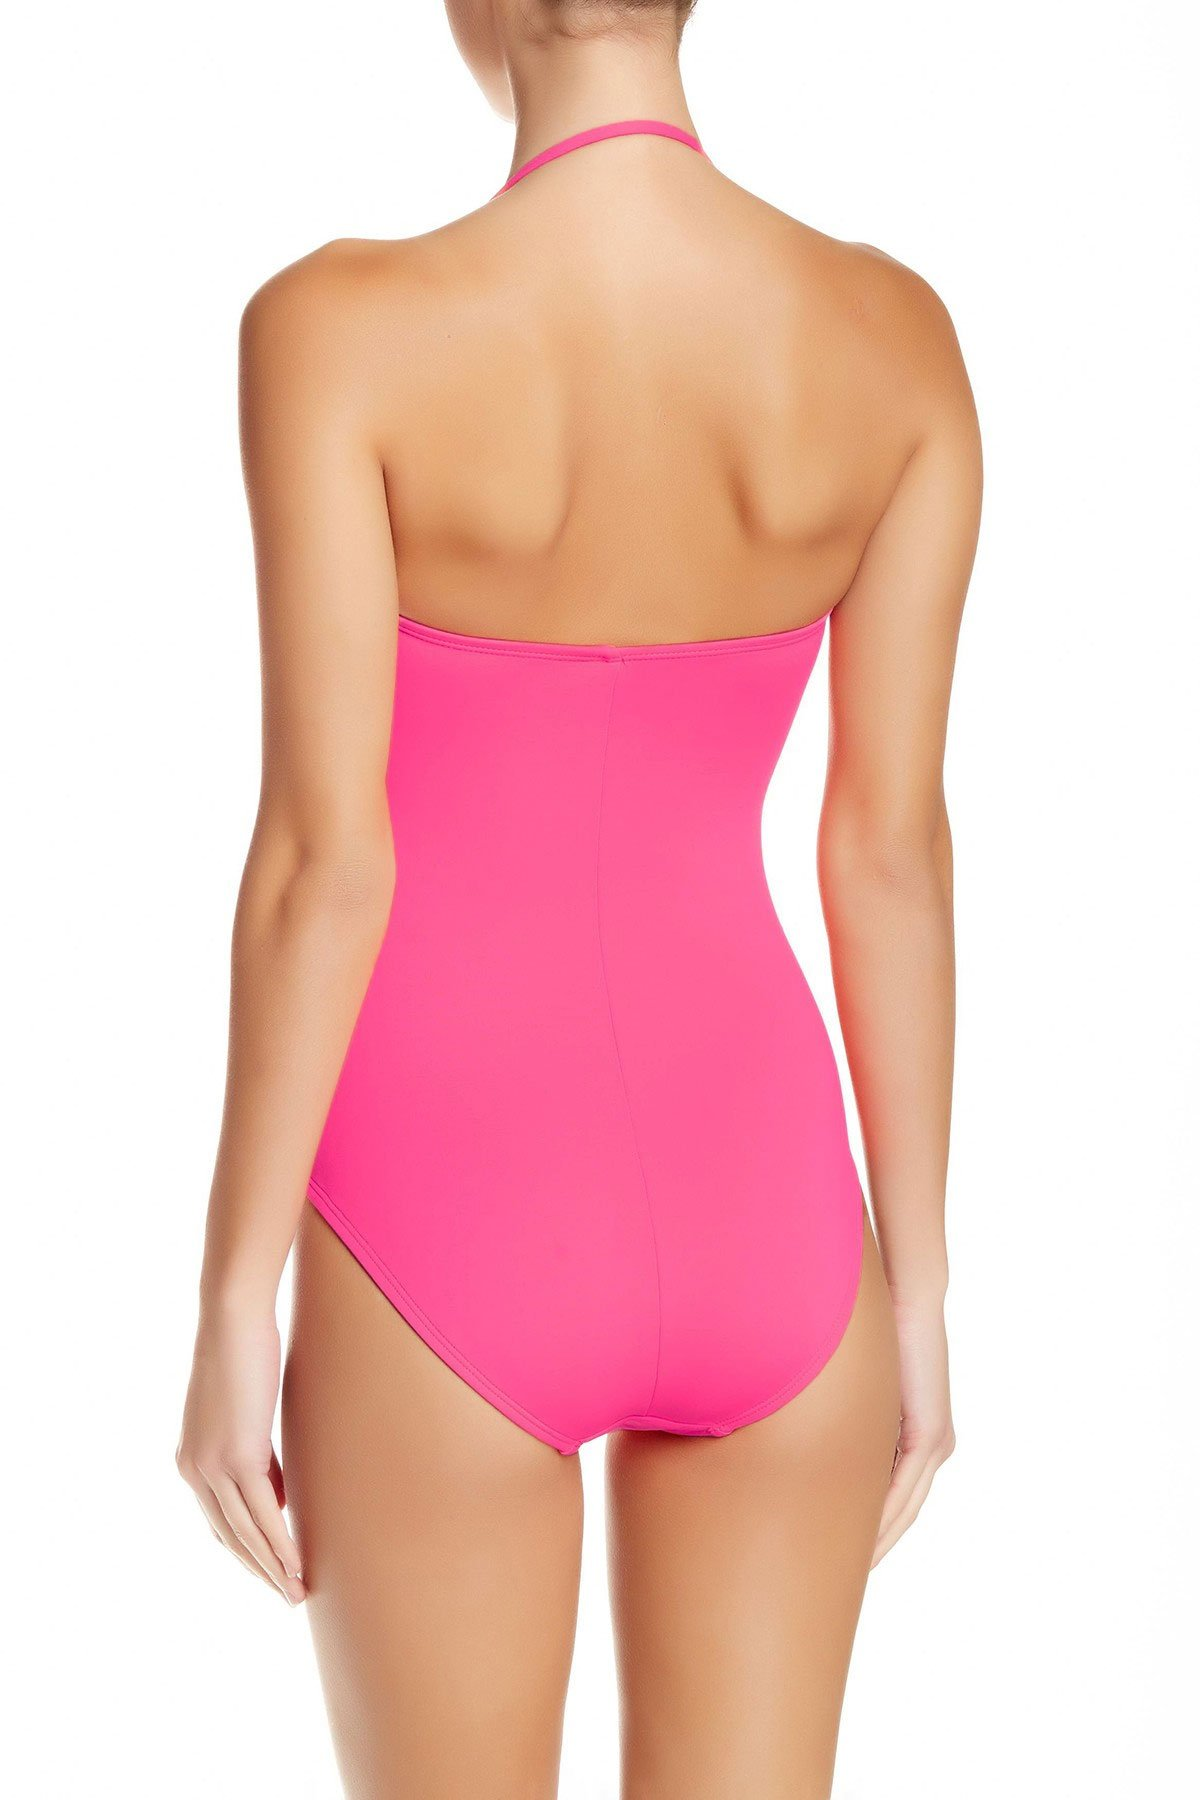 La Blanca Women's Island Goddess One Piece Bandeau Swimsuit Pink Berry 8 by La Blanca (Image #2)